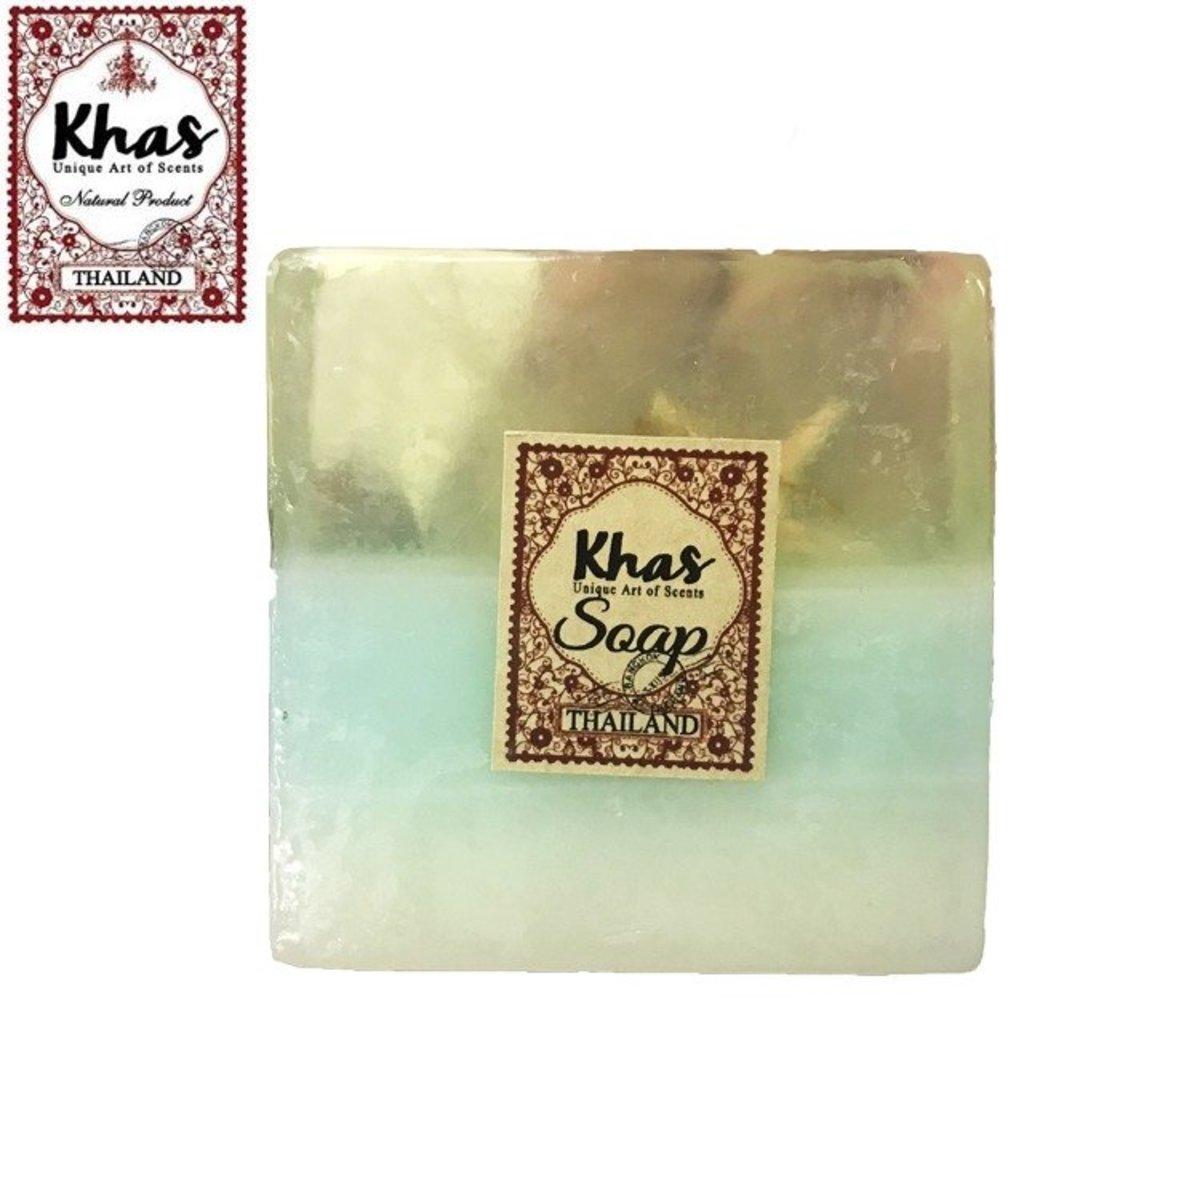 Khas handmade soap (mineral water)